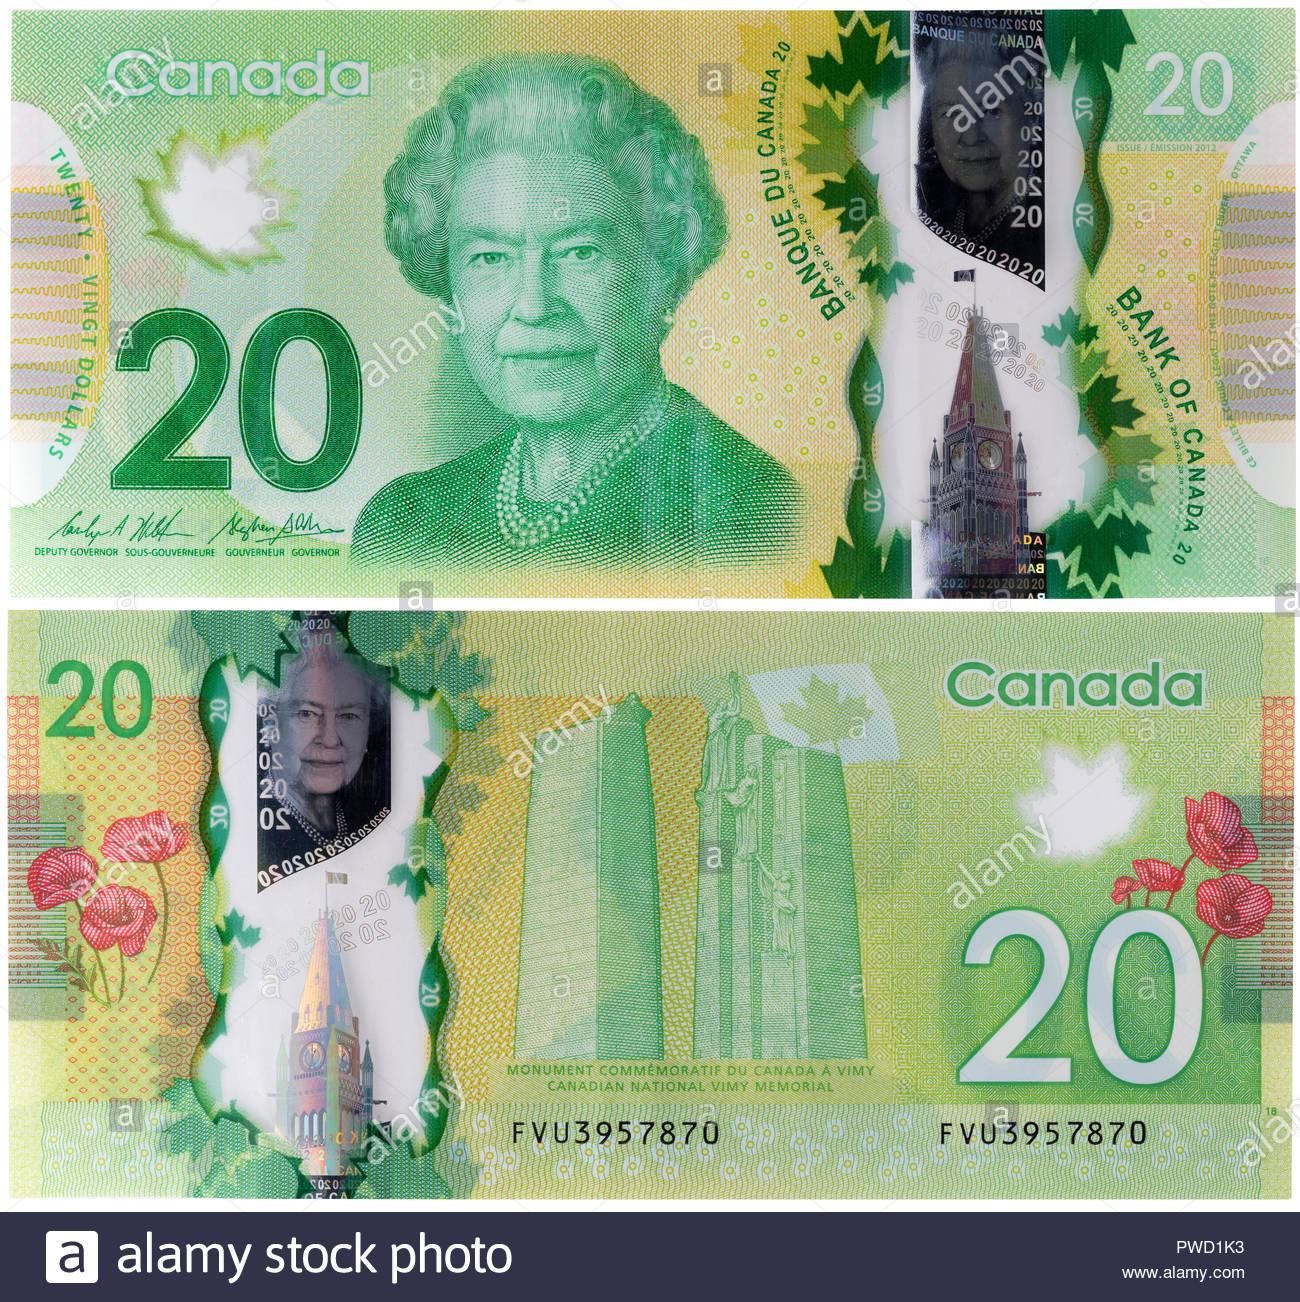 Canadian National Vimy Memorial, Canada, 2012